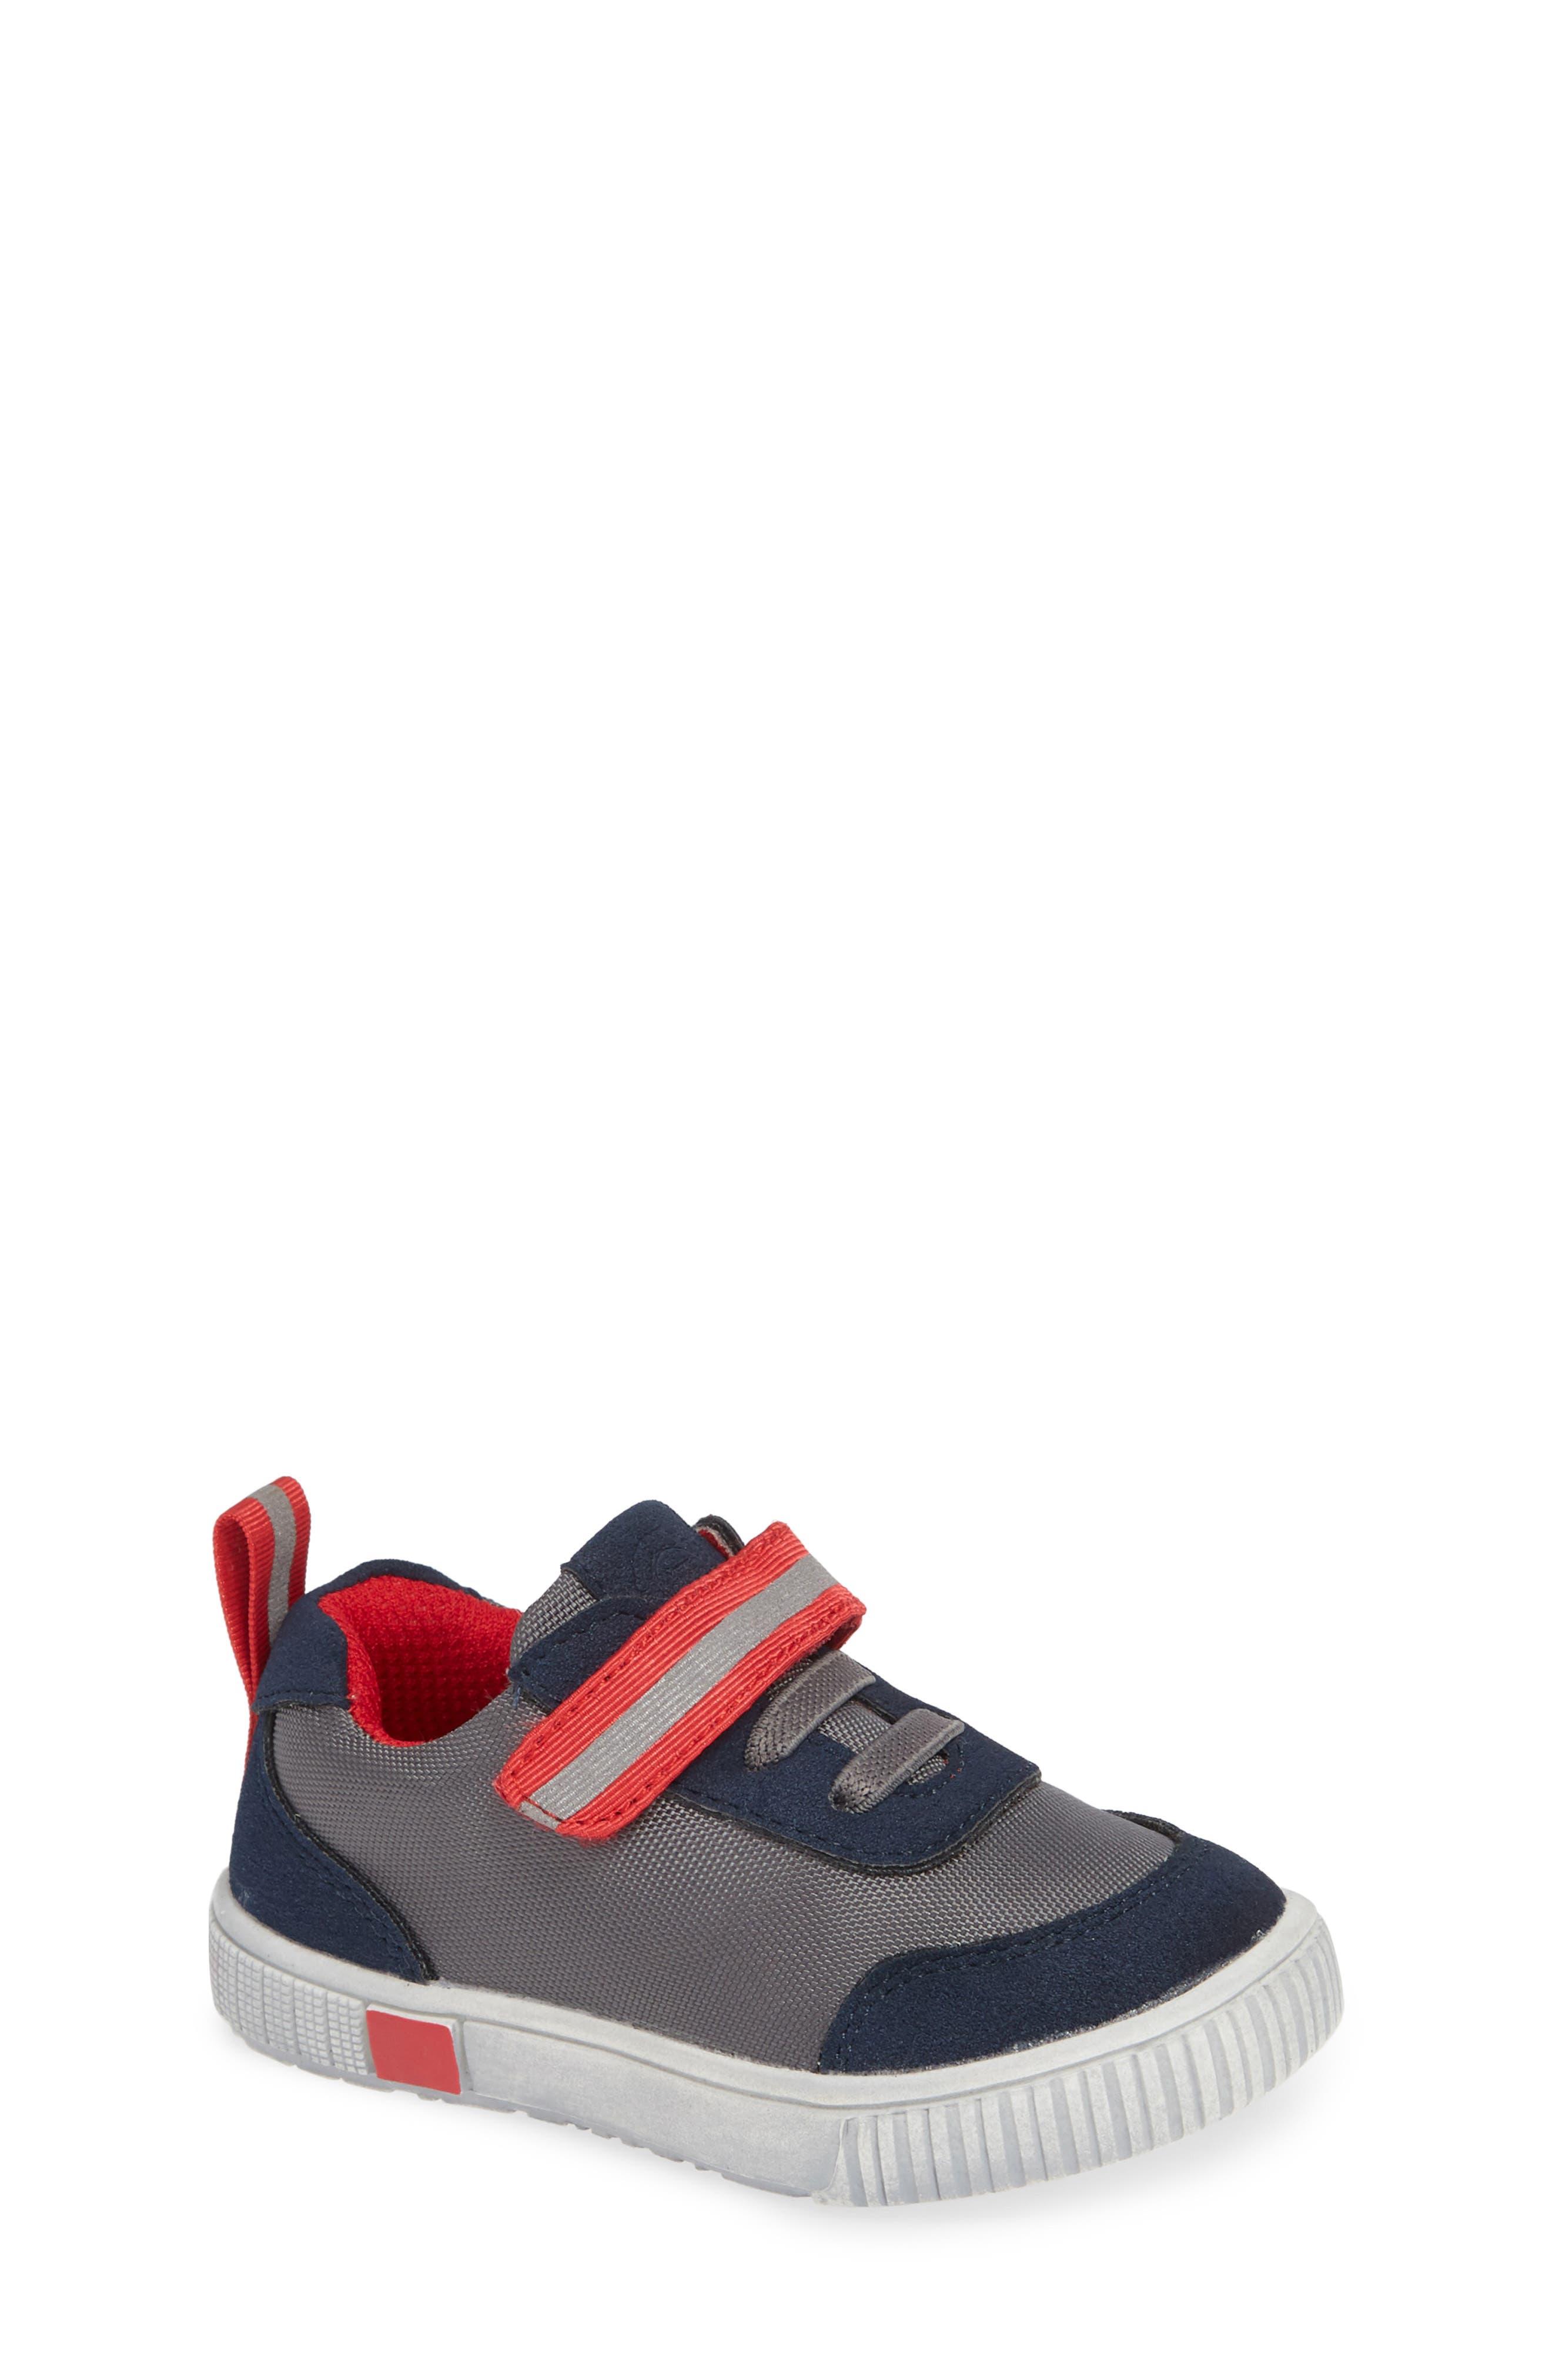 Vault Sneaker,                         Main,                         color, SLATE GREY